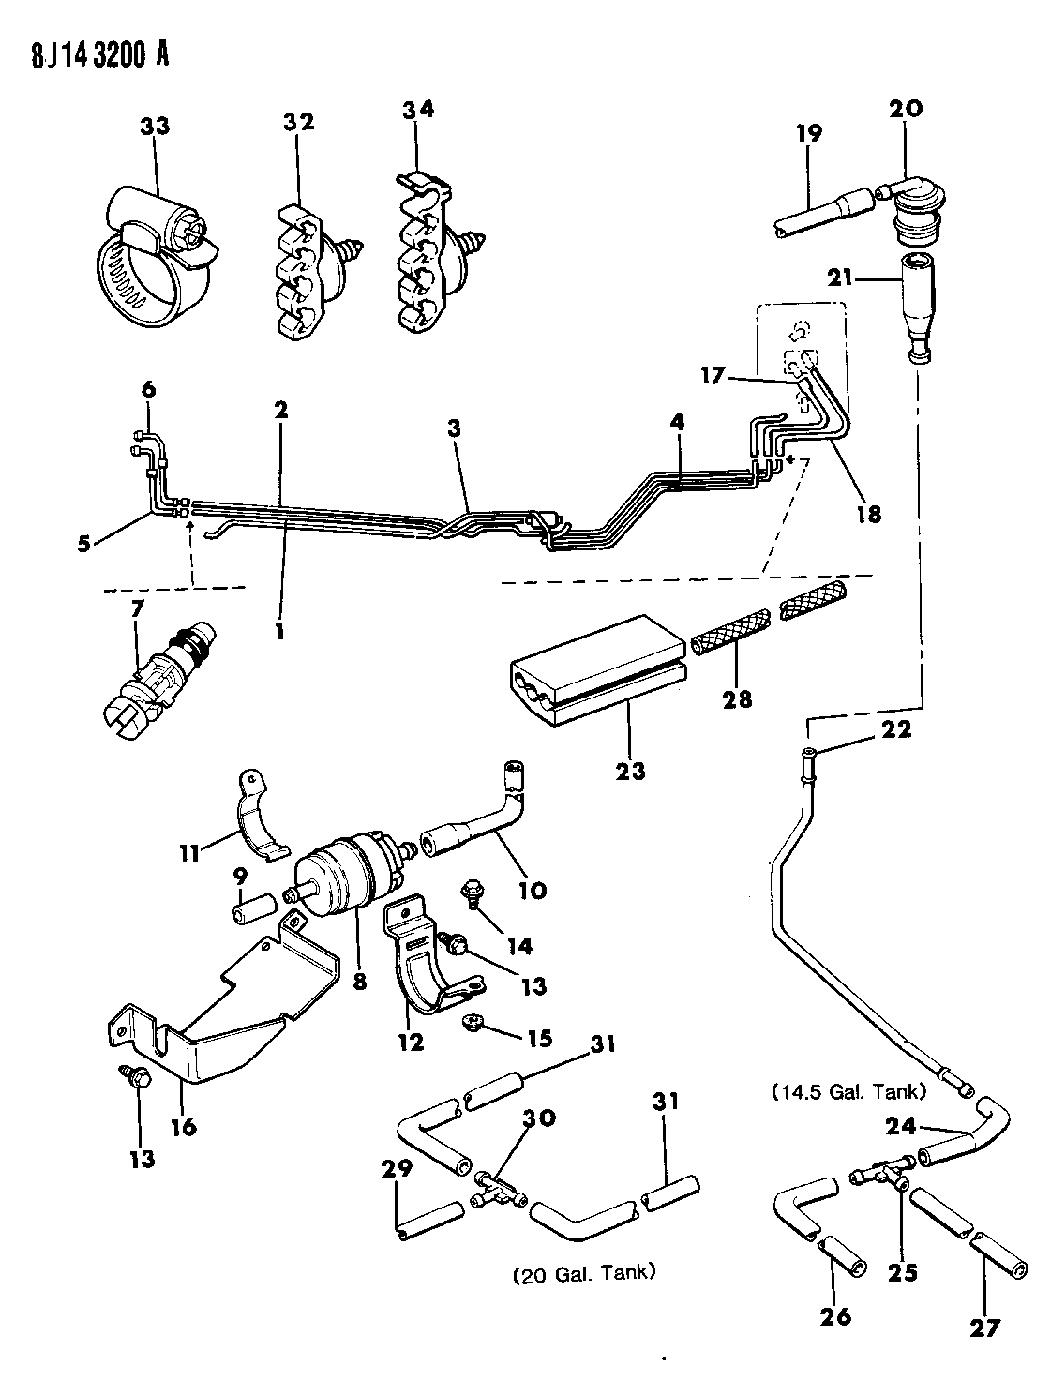 53004047 - Genuine Mopar CONNECTOR-VENT TUBE TO ROLLOVER VALVE